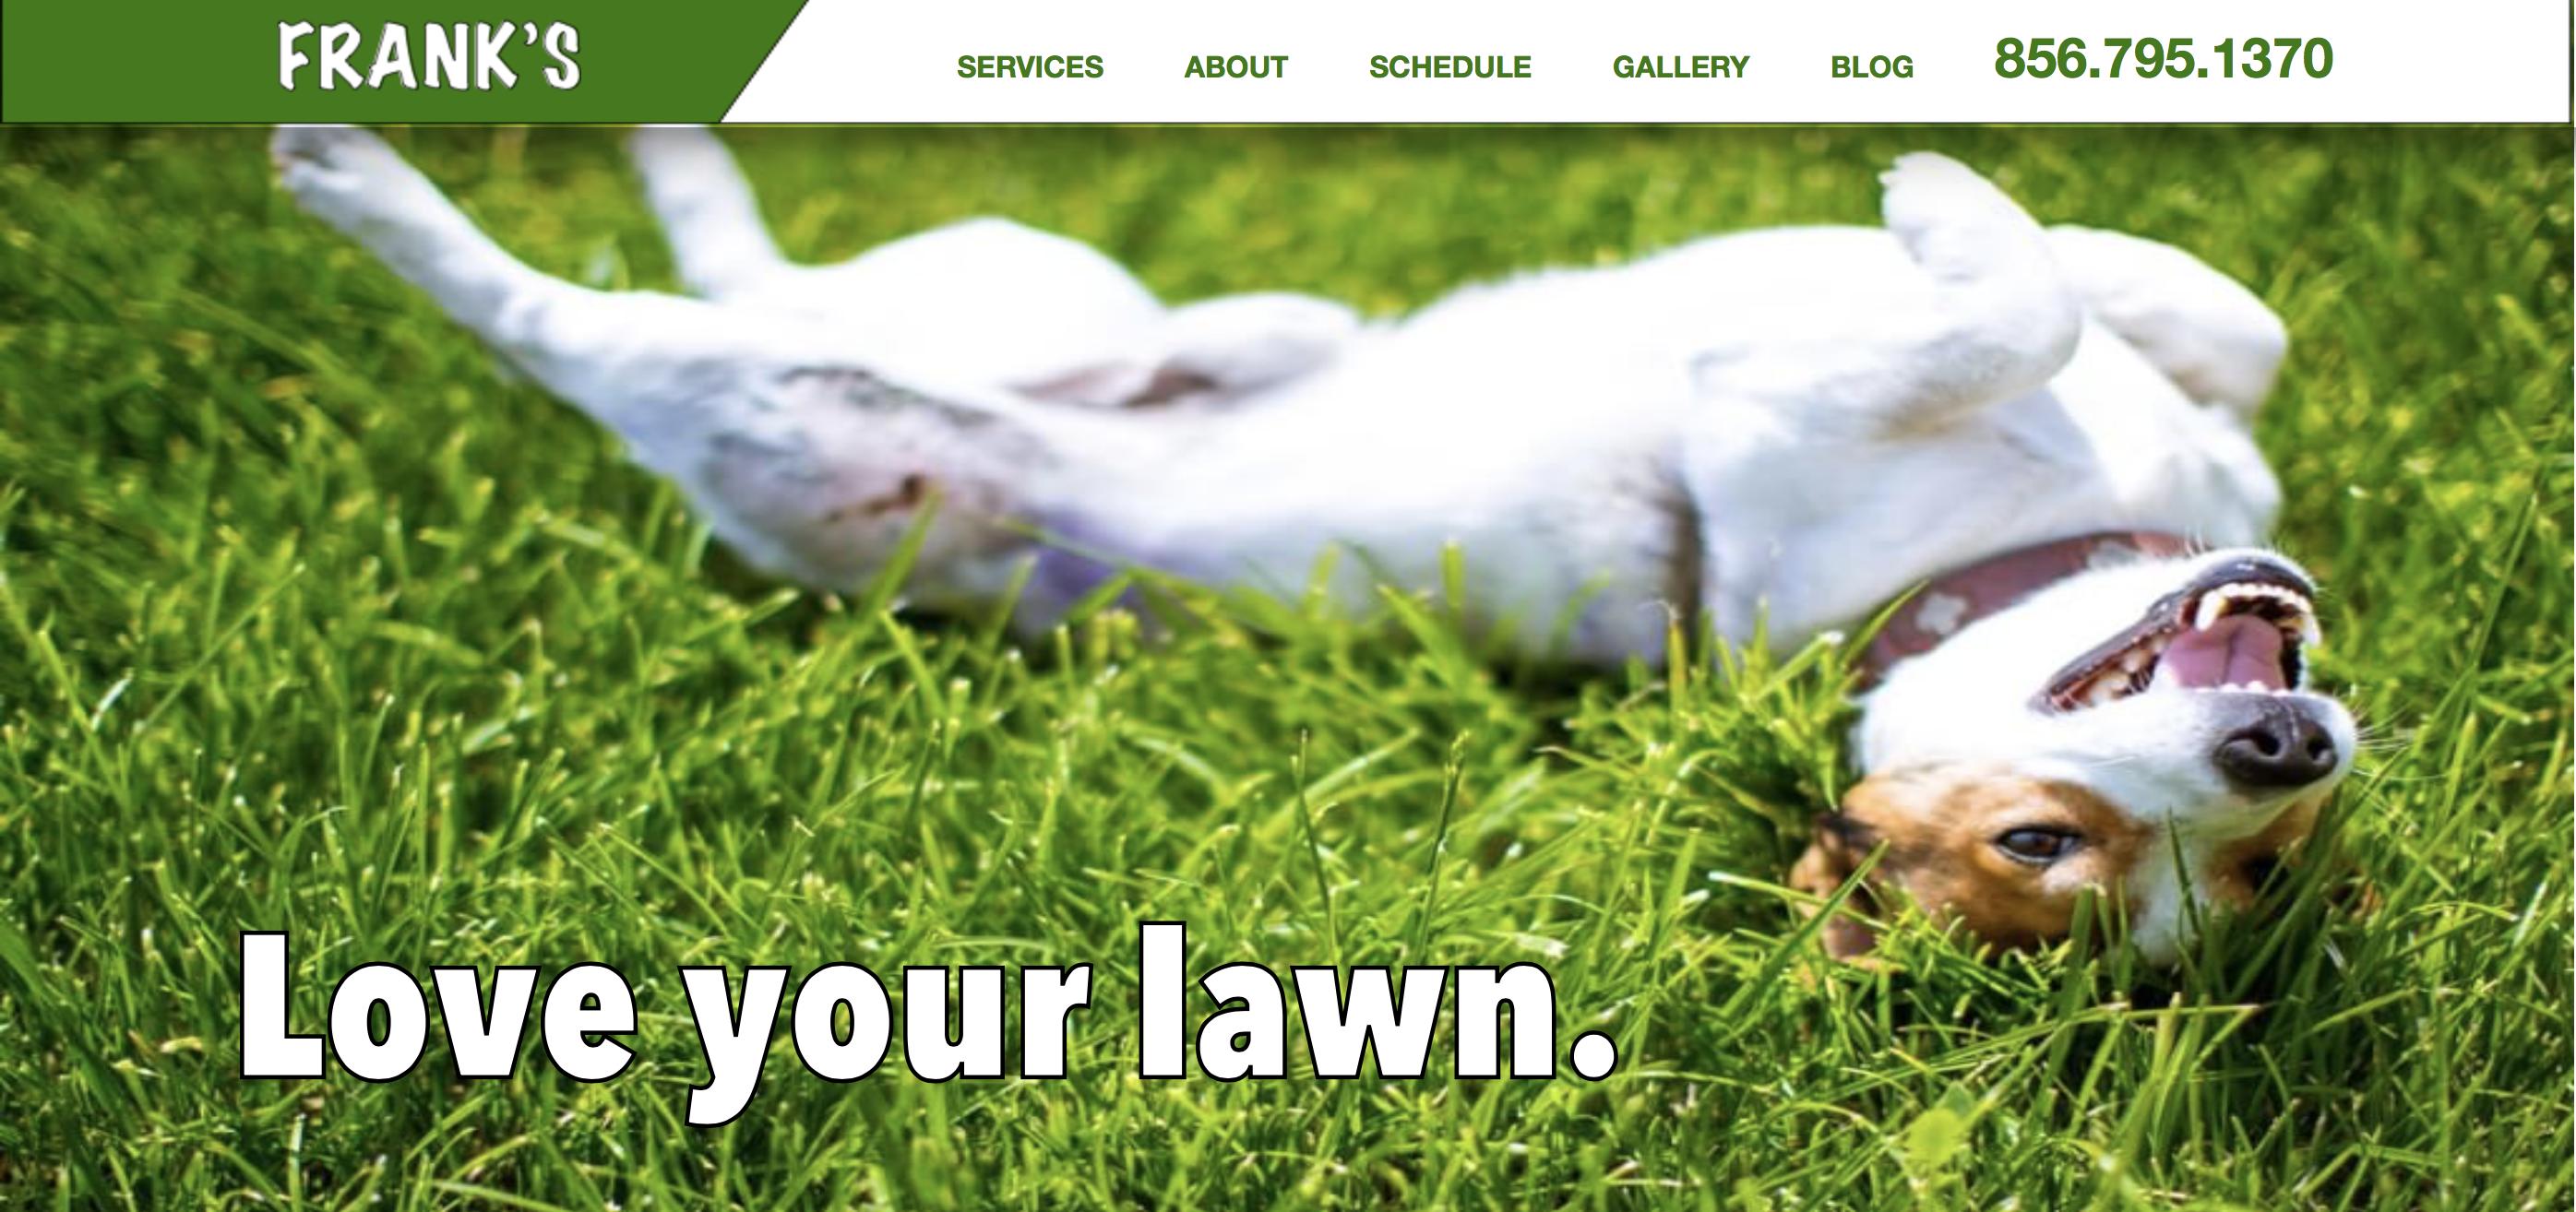 franks-lawn-service